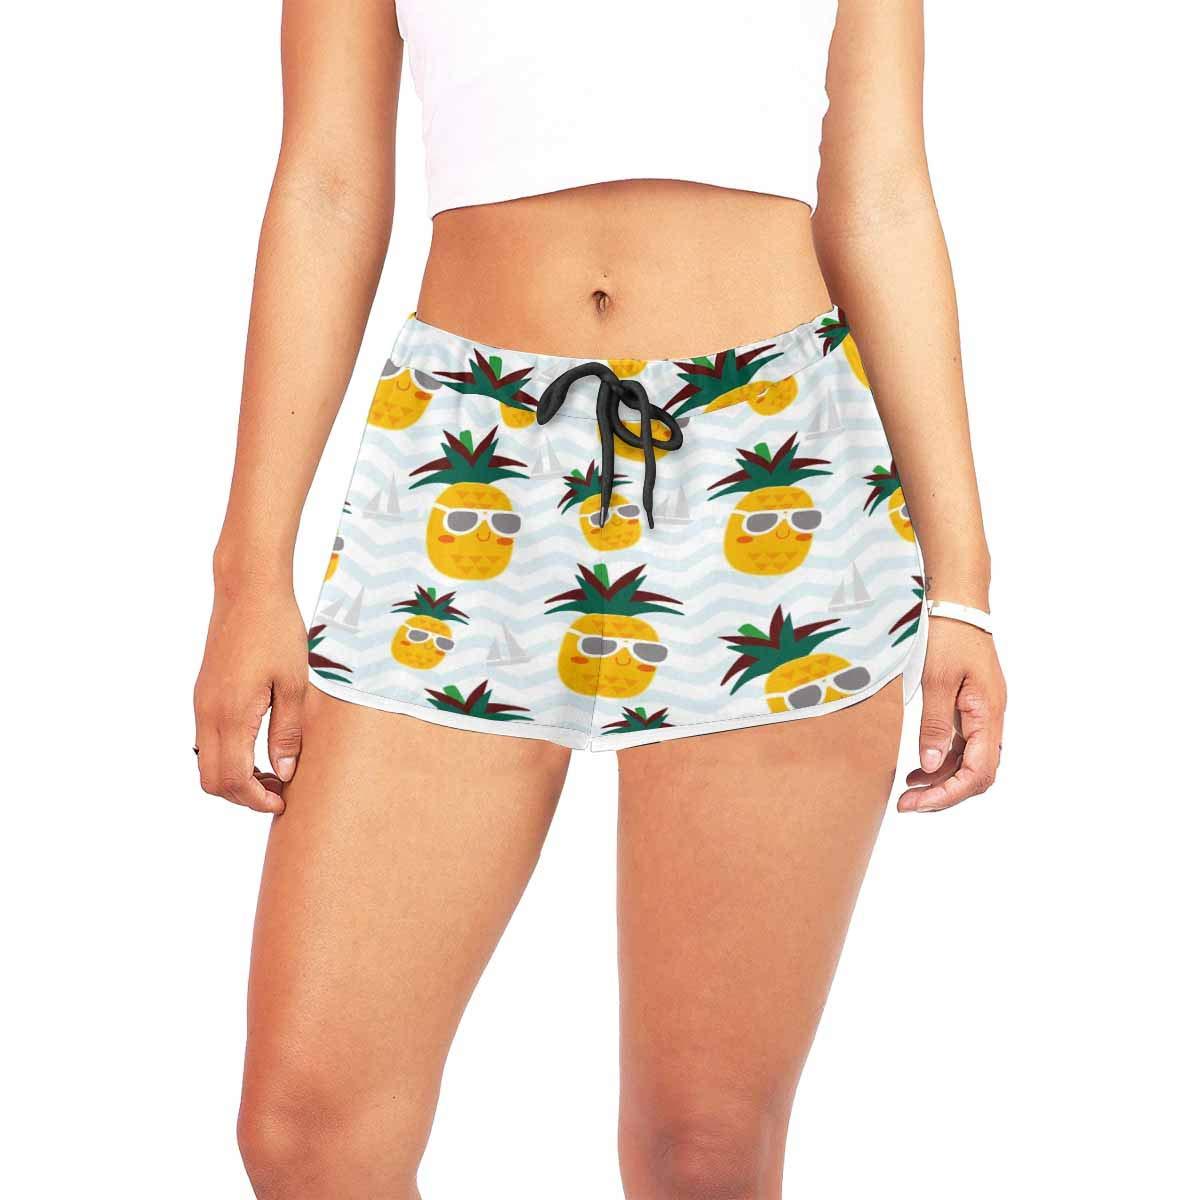 Running Workout Athletic Beach Shorts InterestPrint Novelty Design Womens Shorts